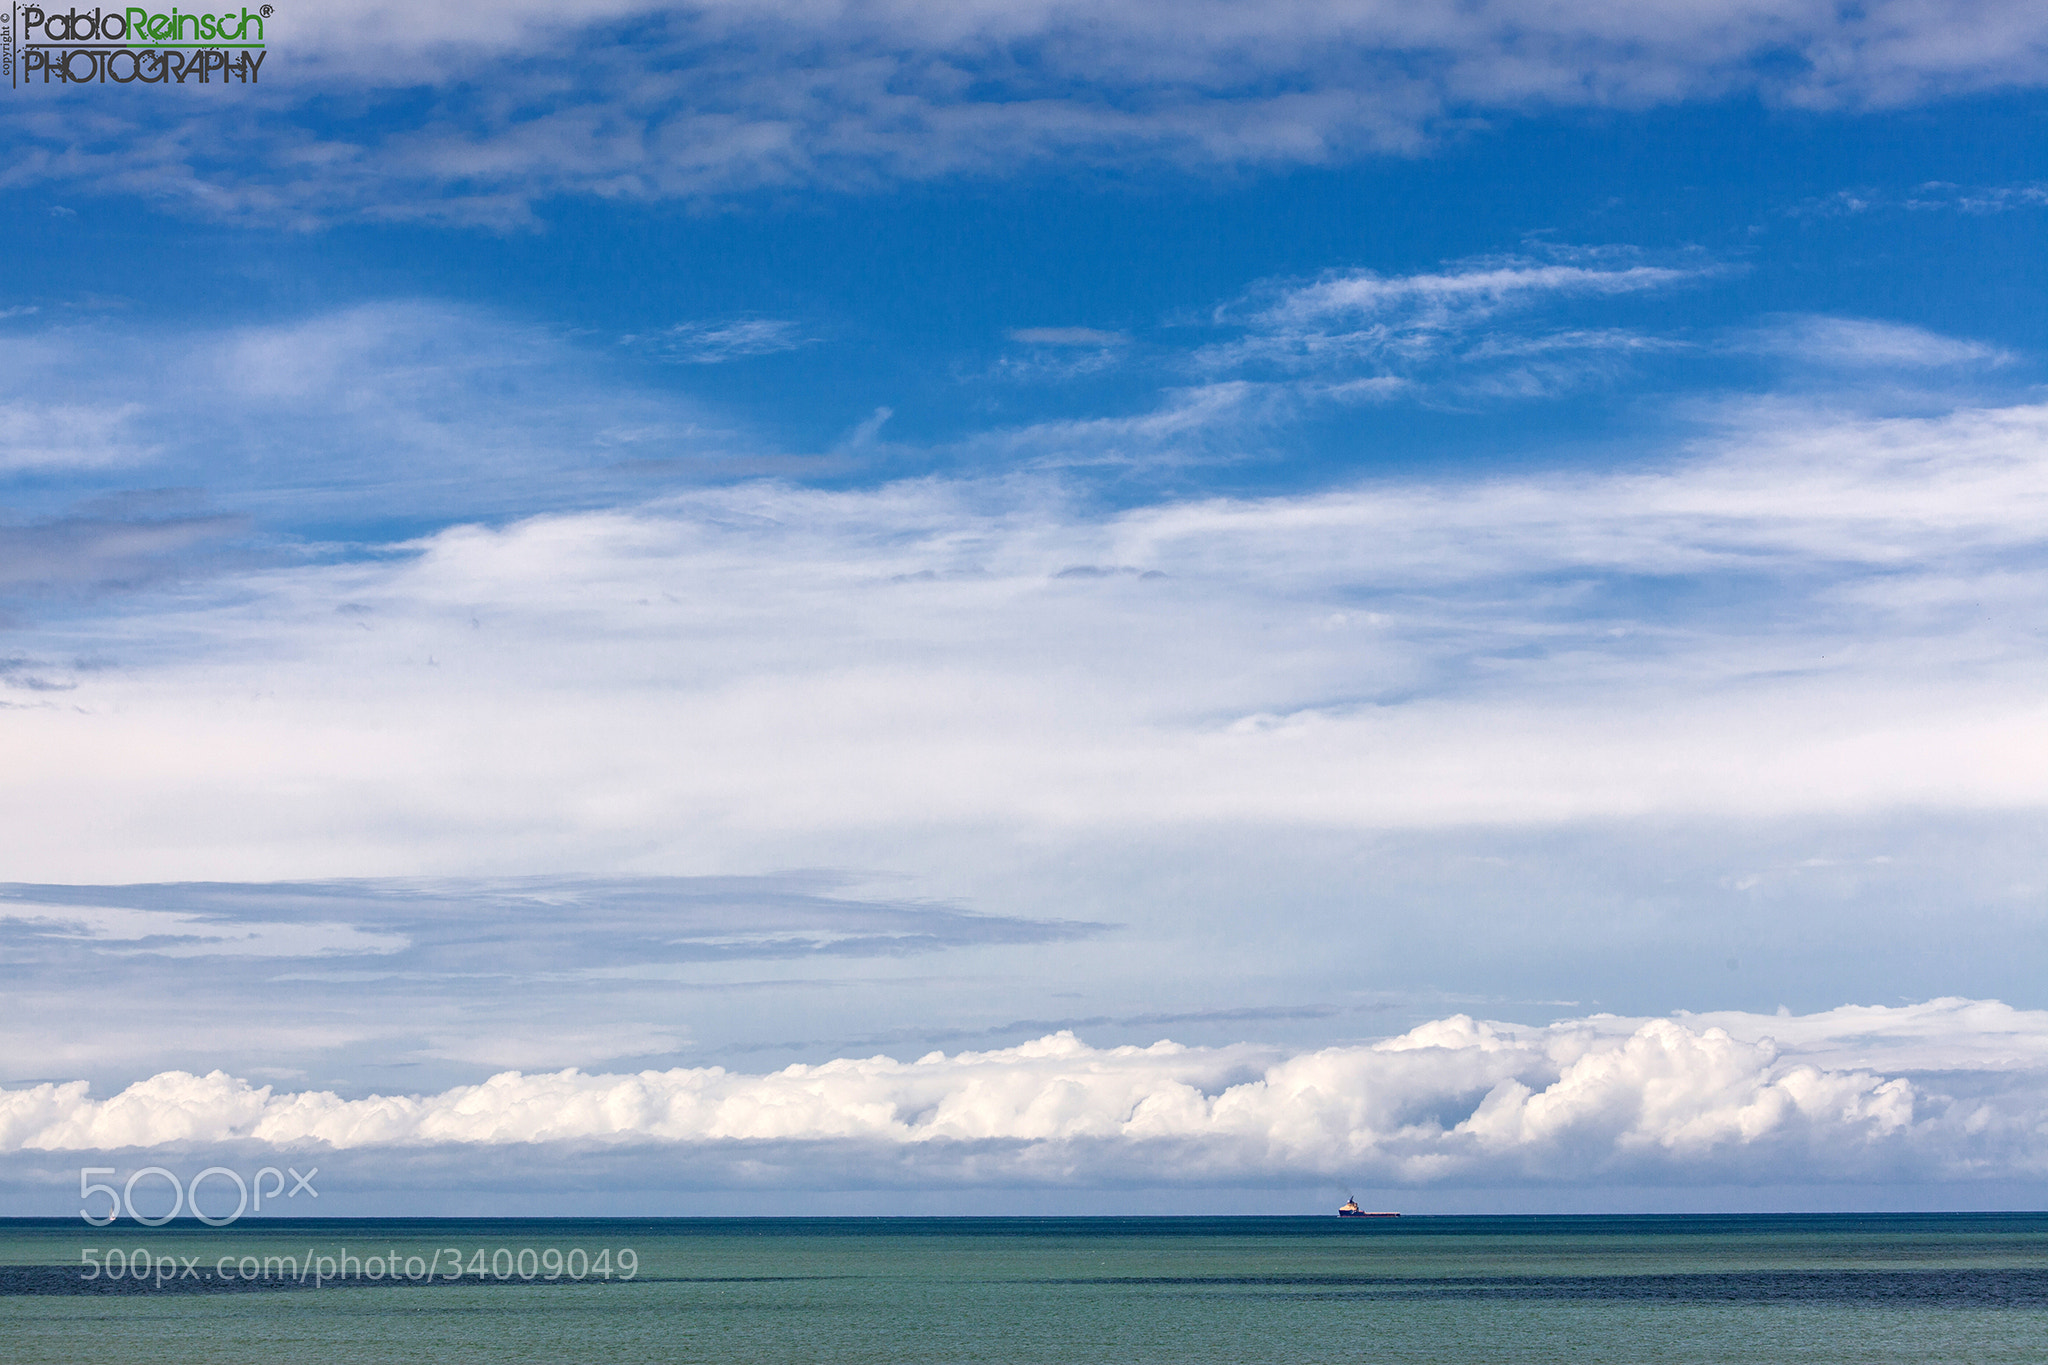 Photograph Sombras de nubes.- by Pablo Reinsch on 500px